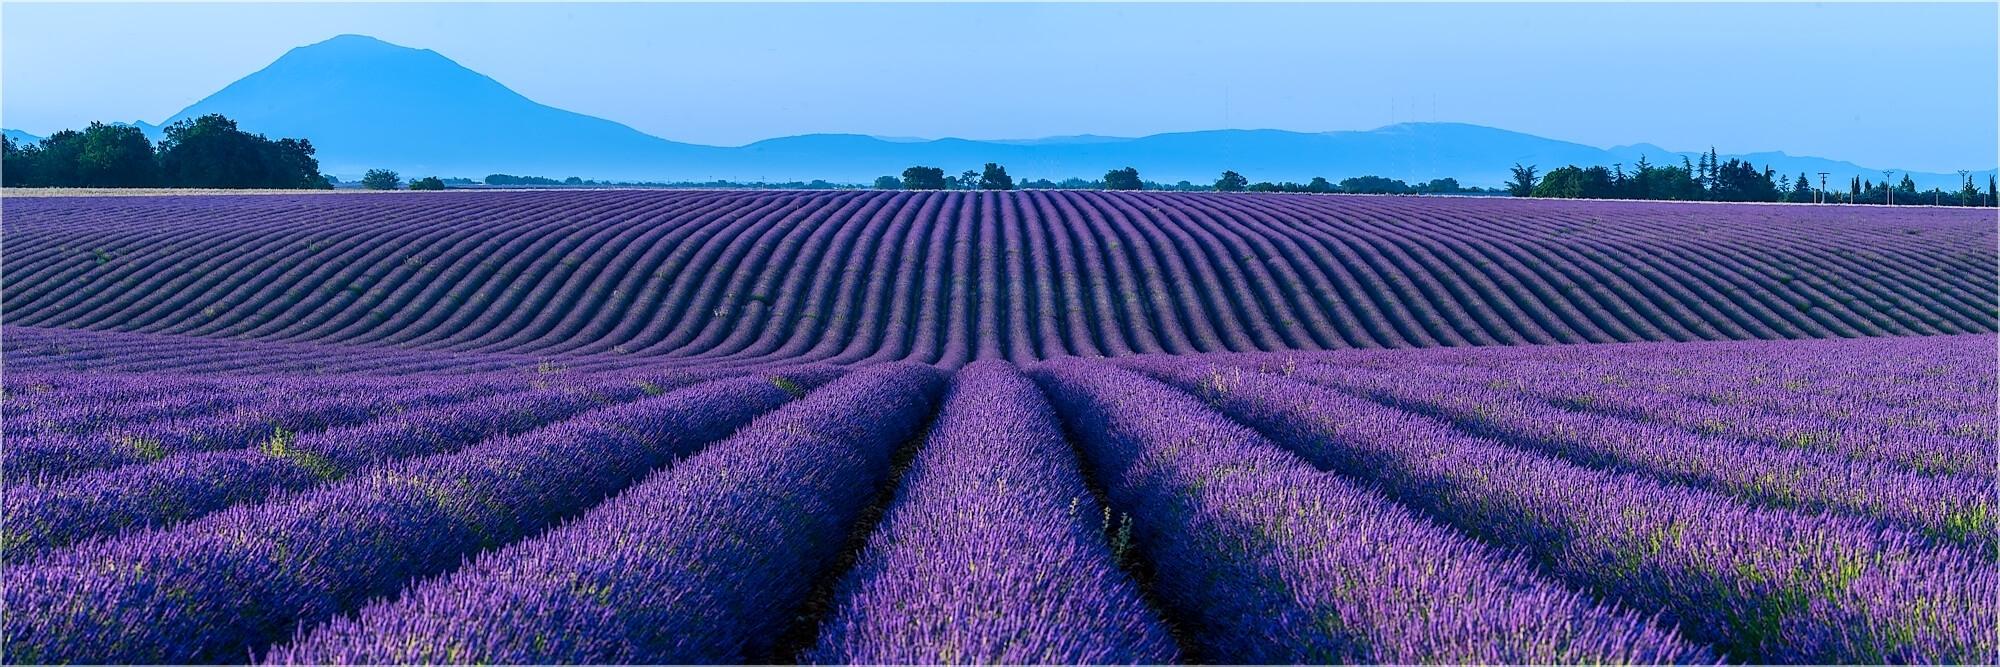 FineArt & Panoramafotografien aus Frankreich